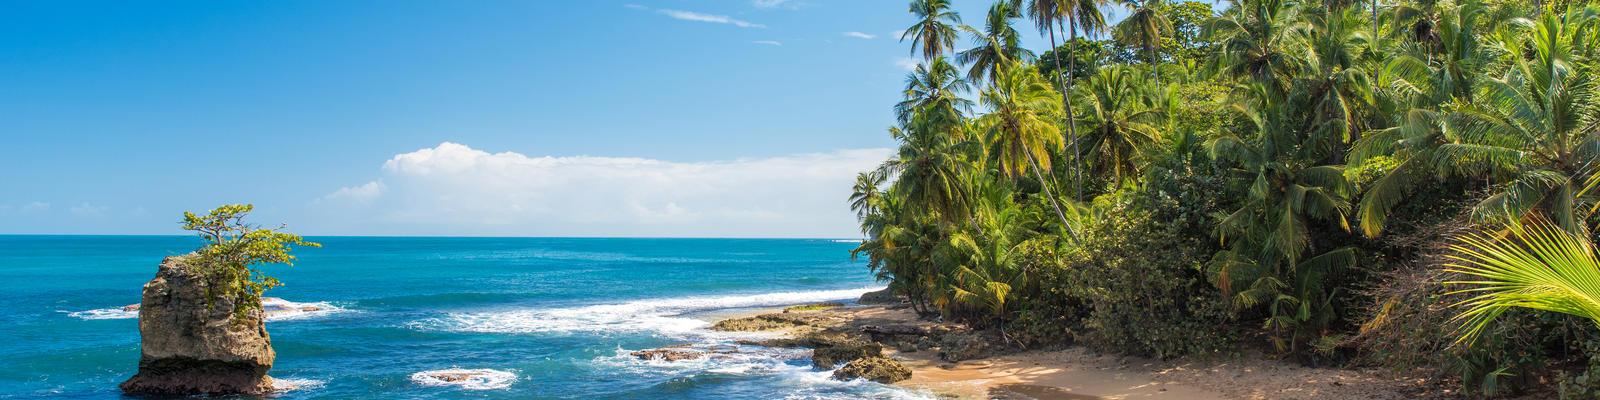 Beach of Manzanillo at Puerto Viejo, Costa Rica (Photo: Simon Dannhauer)